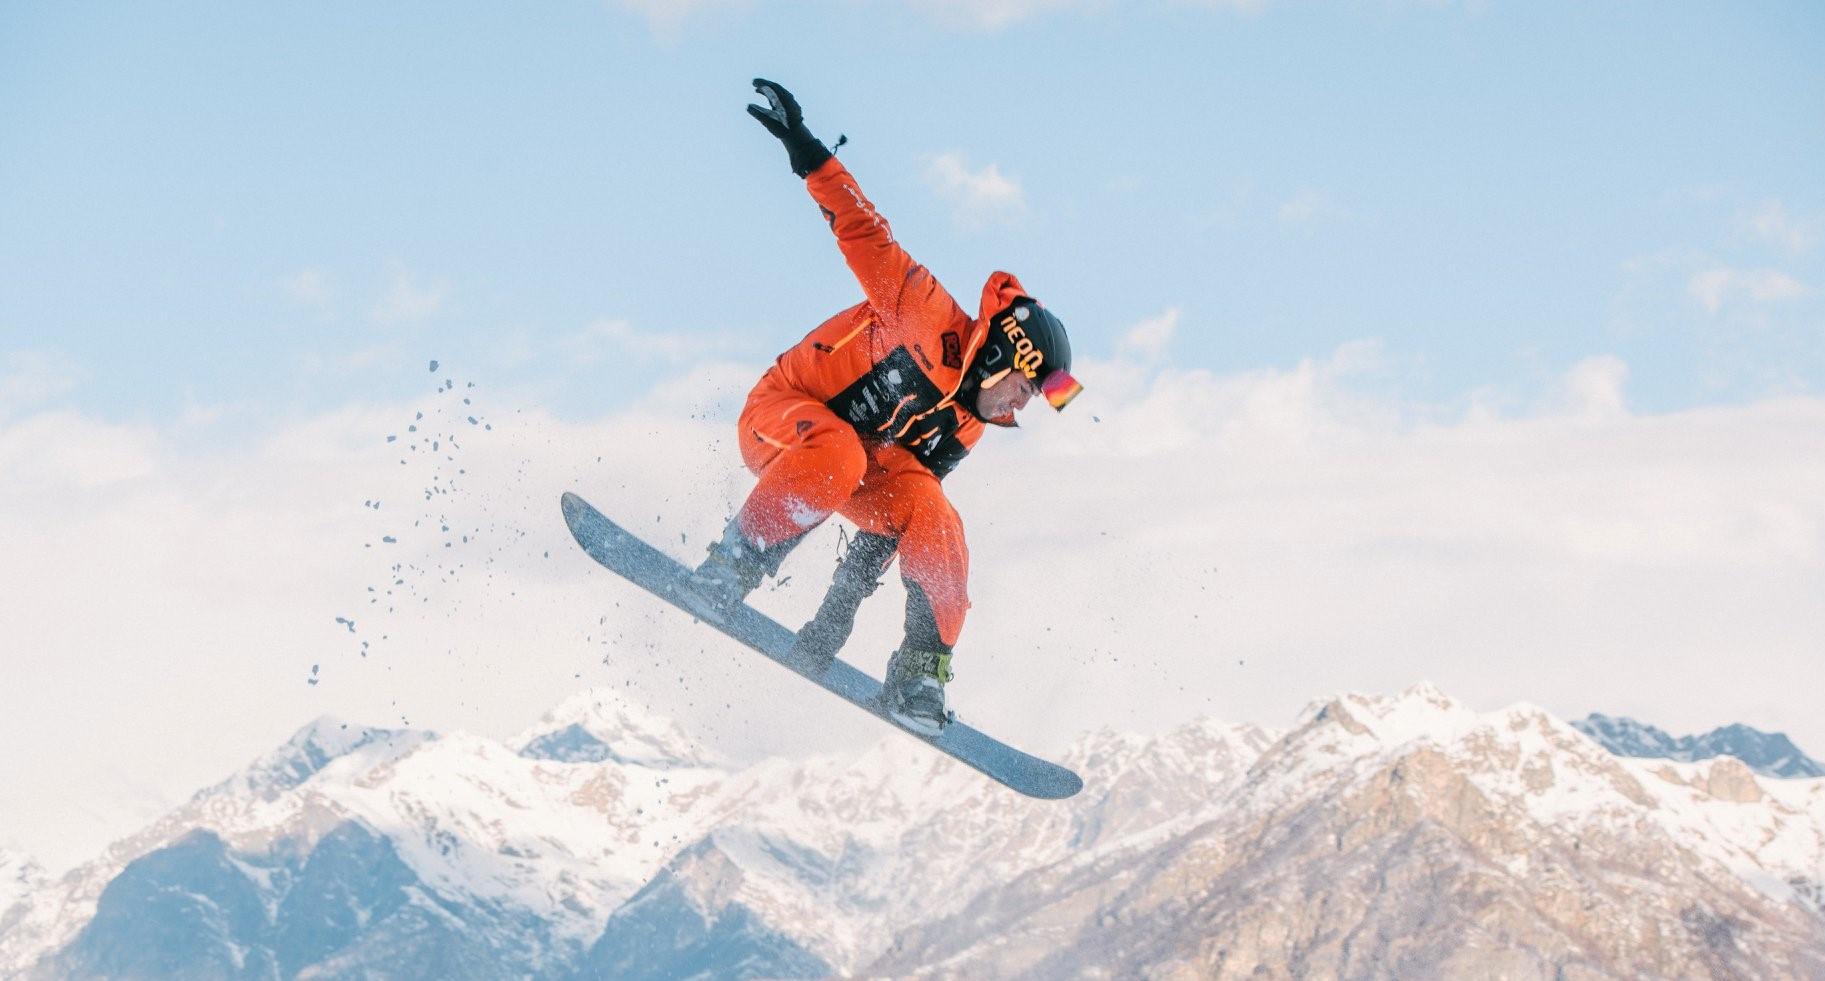 Lezione privata di snowboard all'Alpe di Mera in Valsesia per tutti i livelli